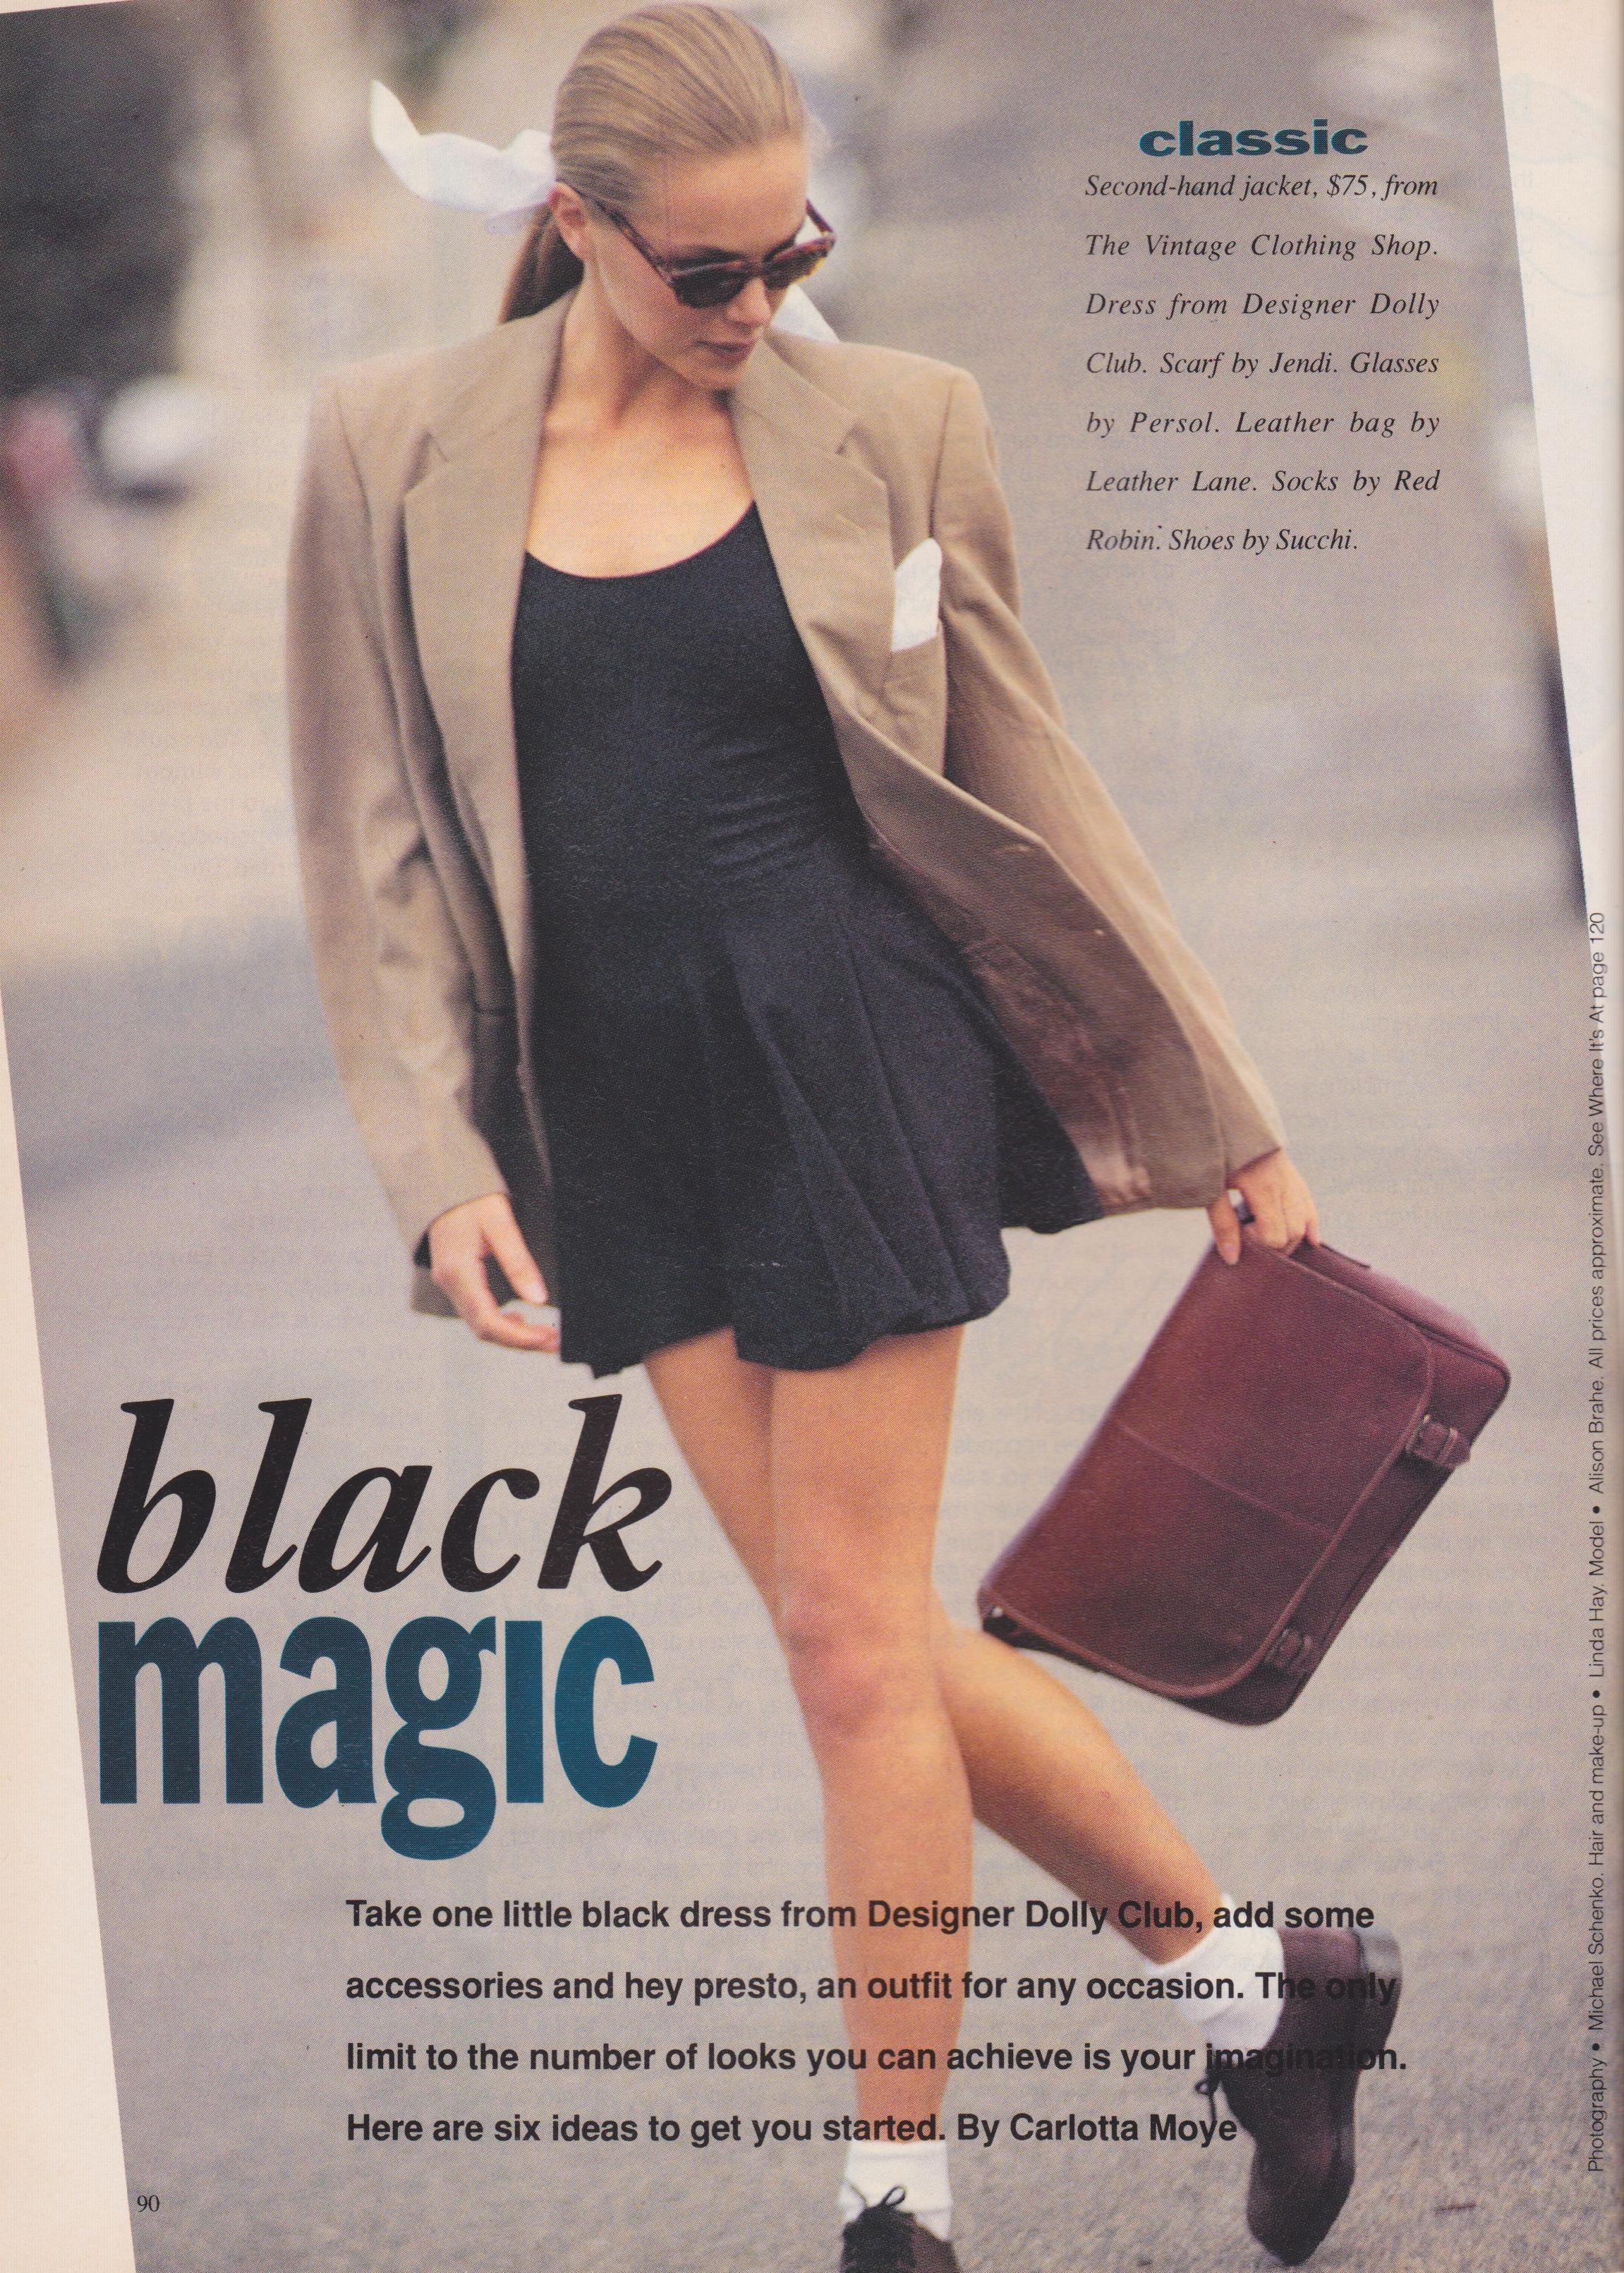 Dolly January 1991 | Alison Brahe | Black Magic 01.jpeg